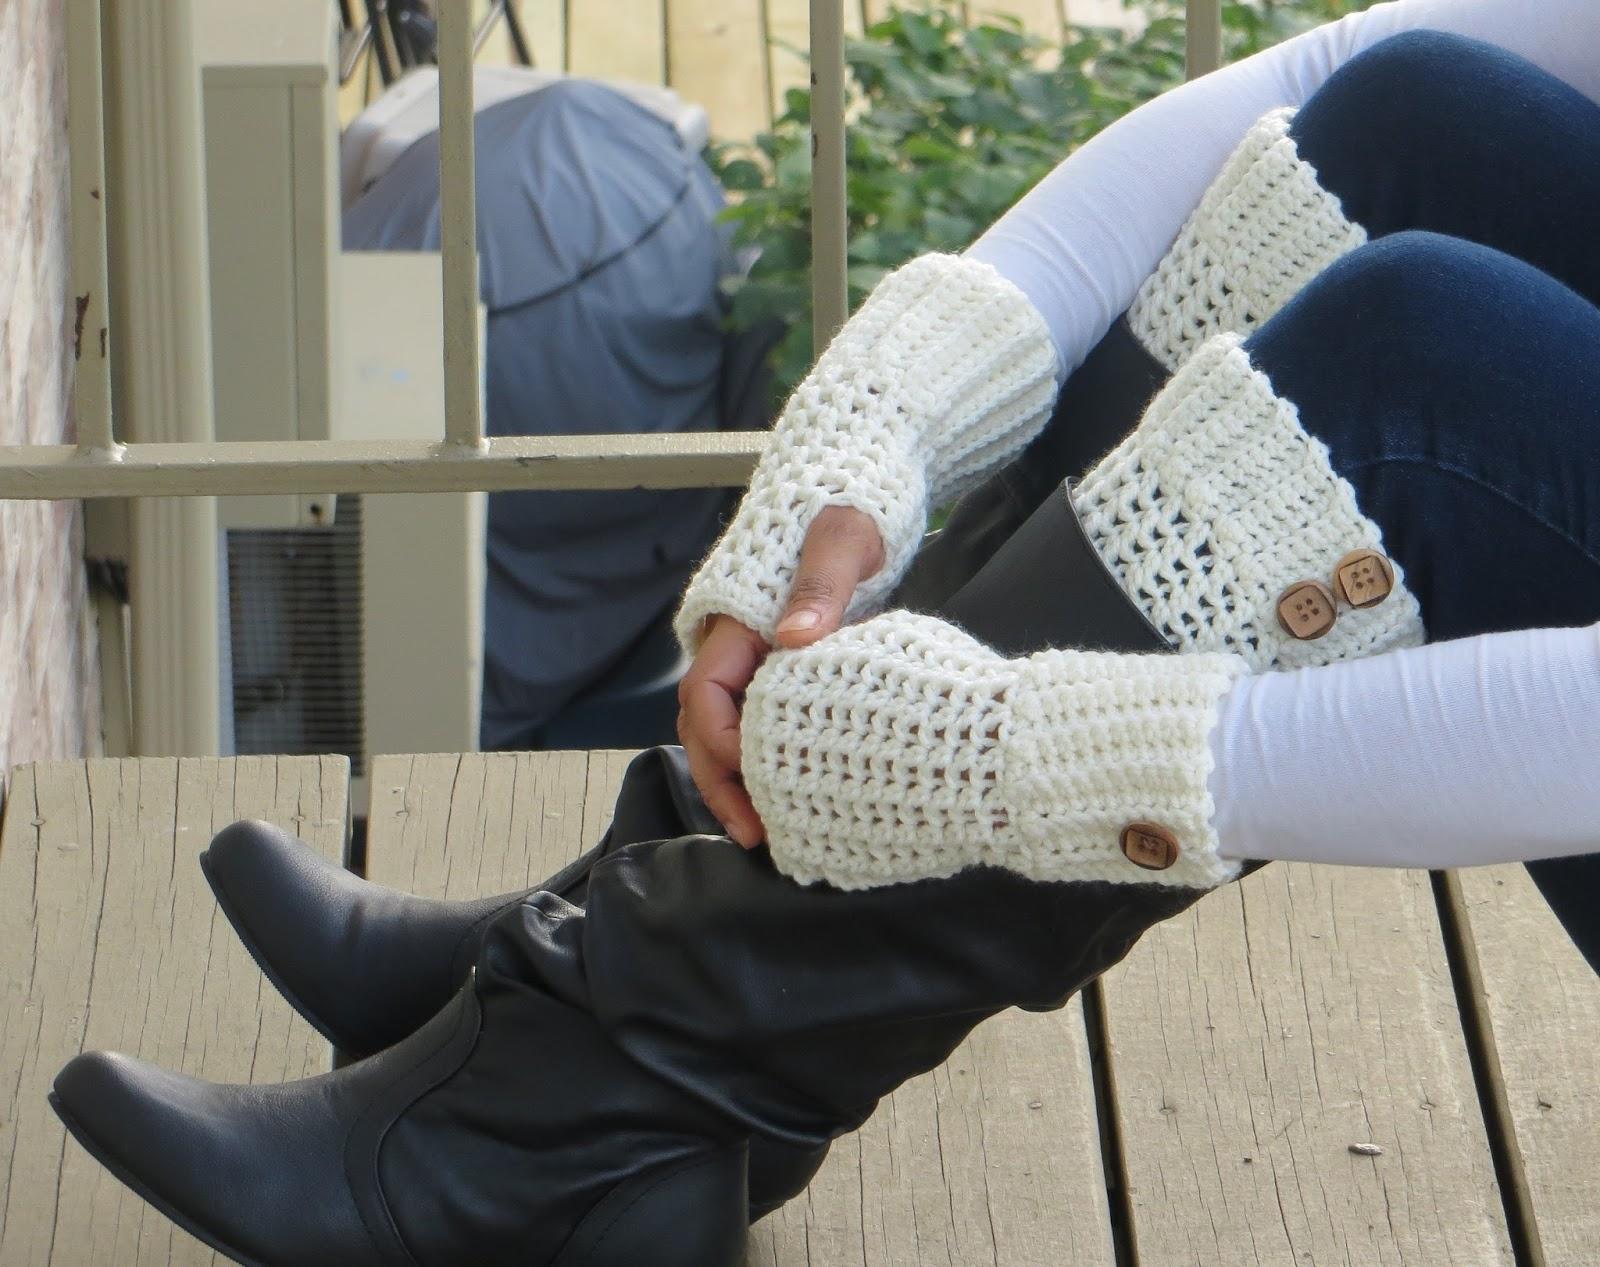 Crochet dreamz brooklyn boot cuffs free crochet pattern brooklyn boot cuffs free crochet pattern bankloansurffo Images